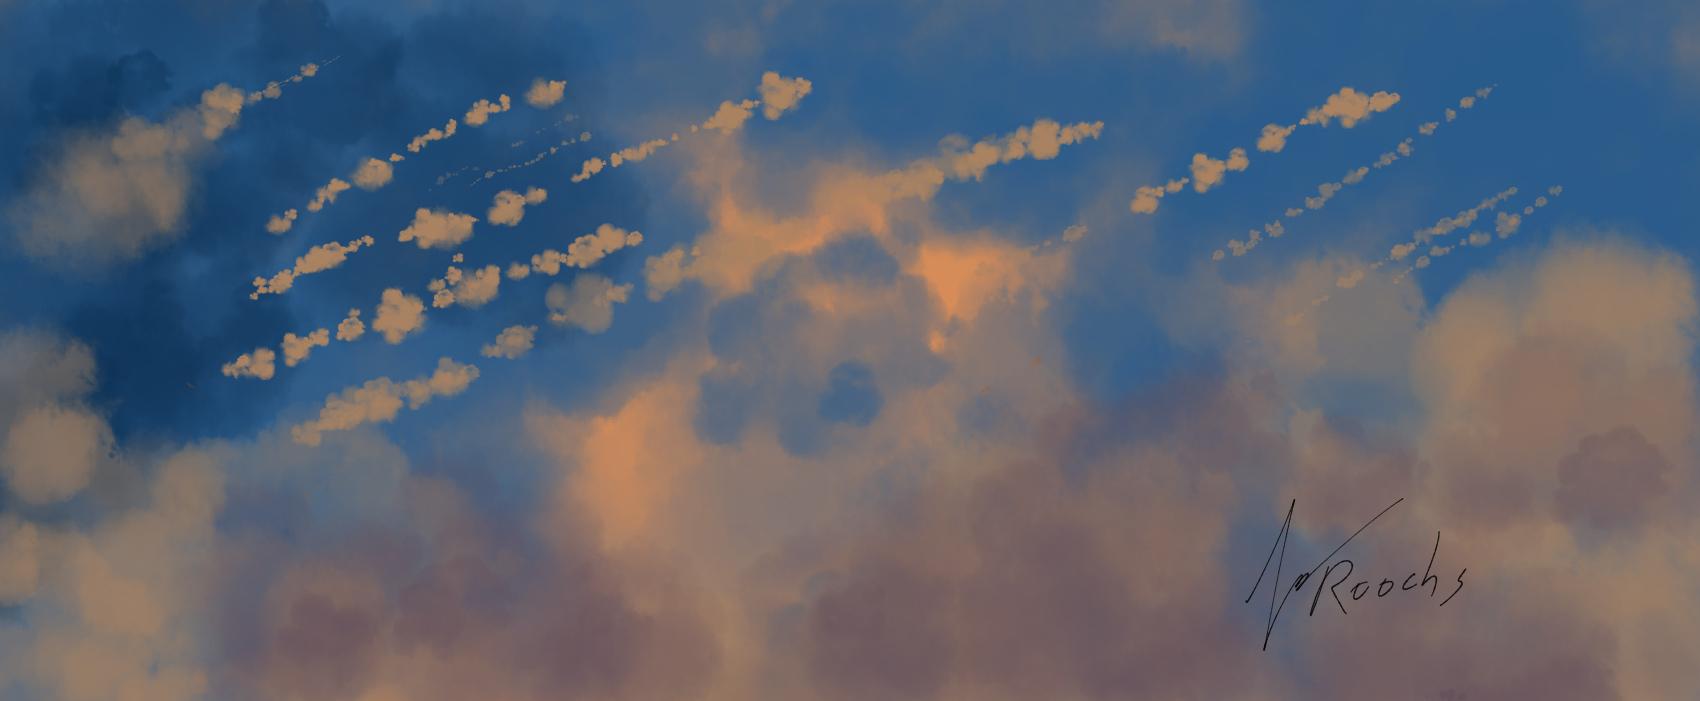 Cloud Sun Rain by Roochs